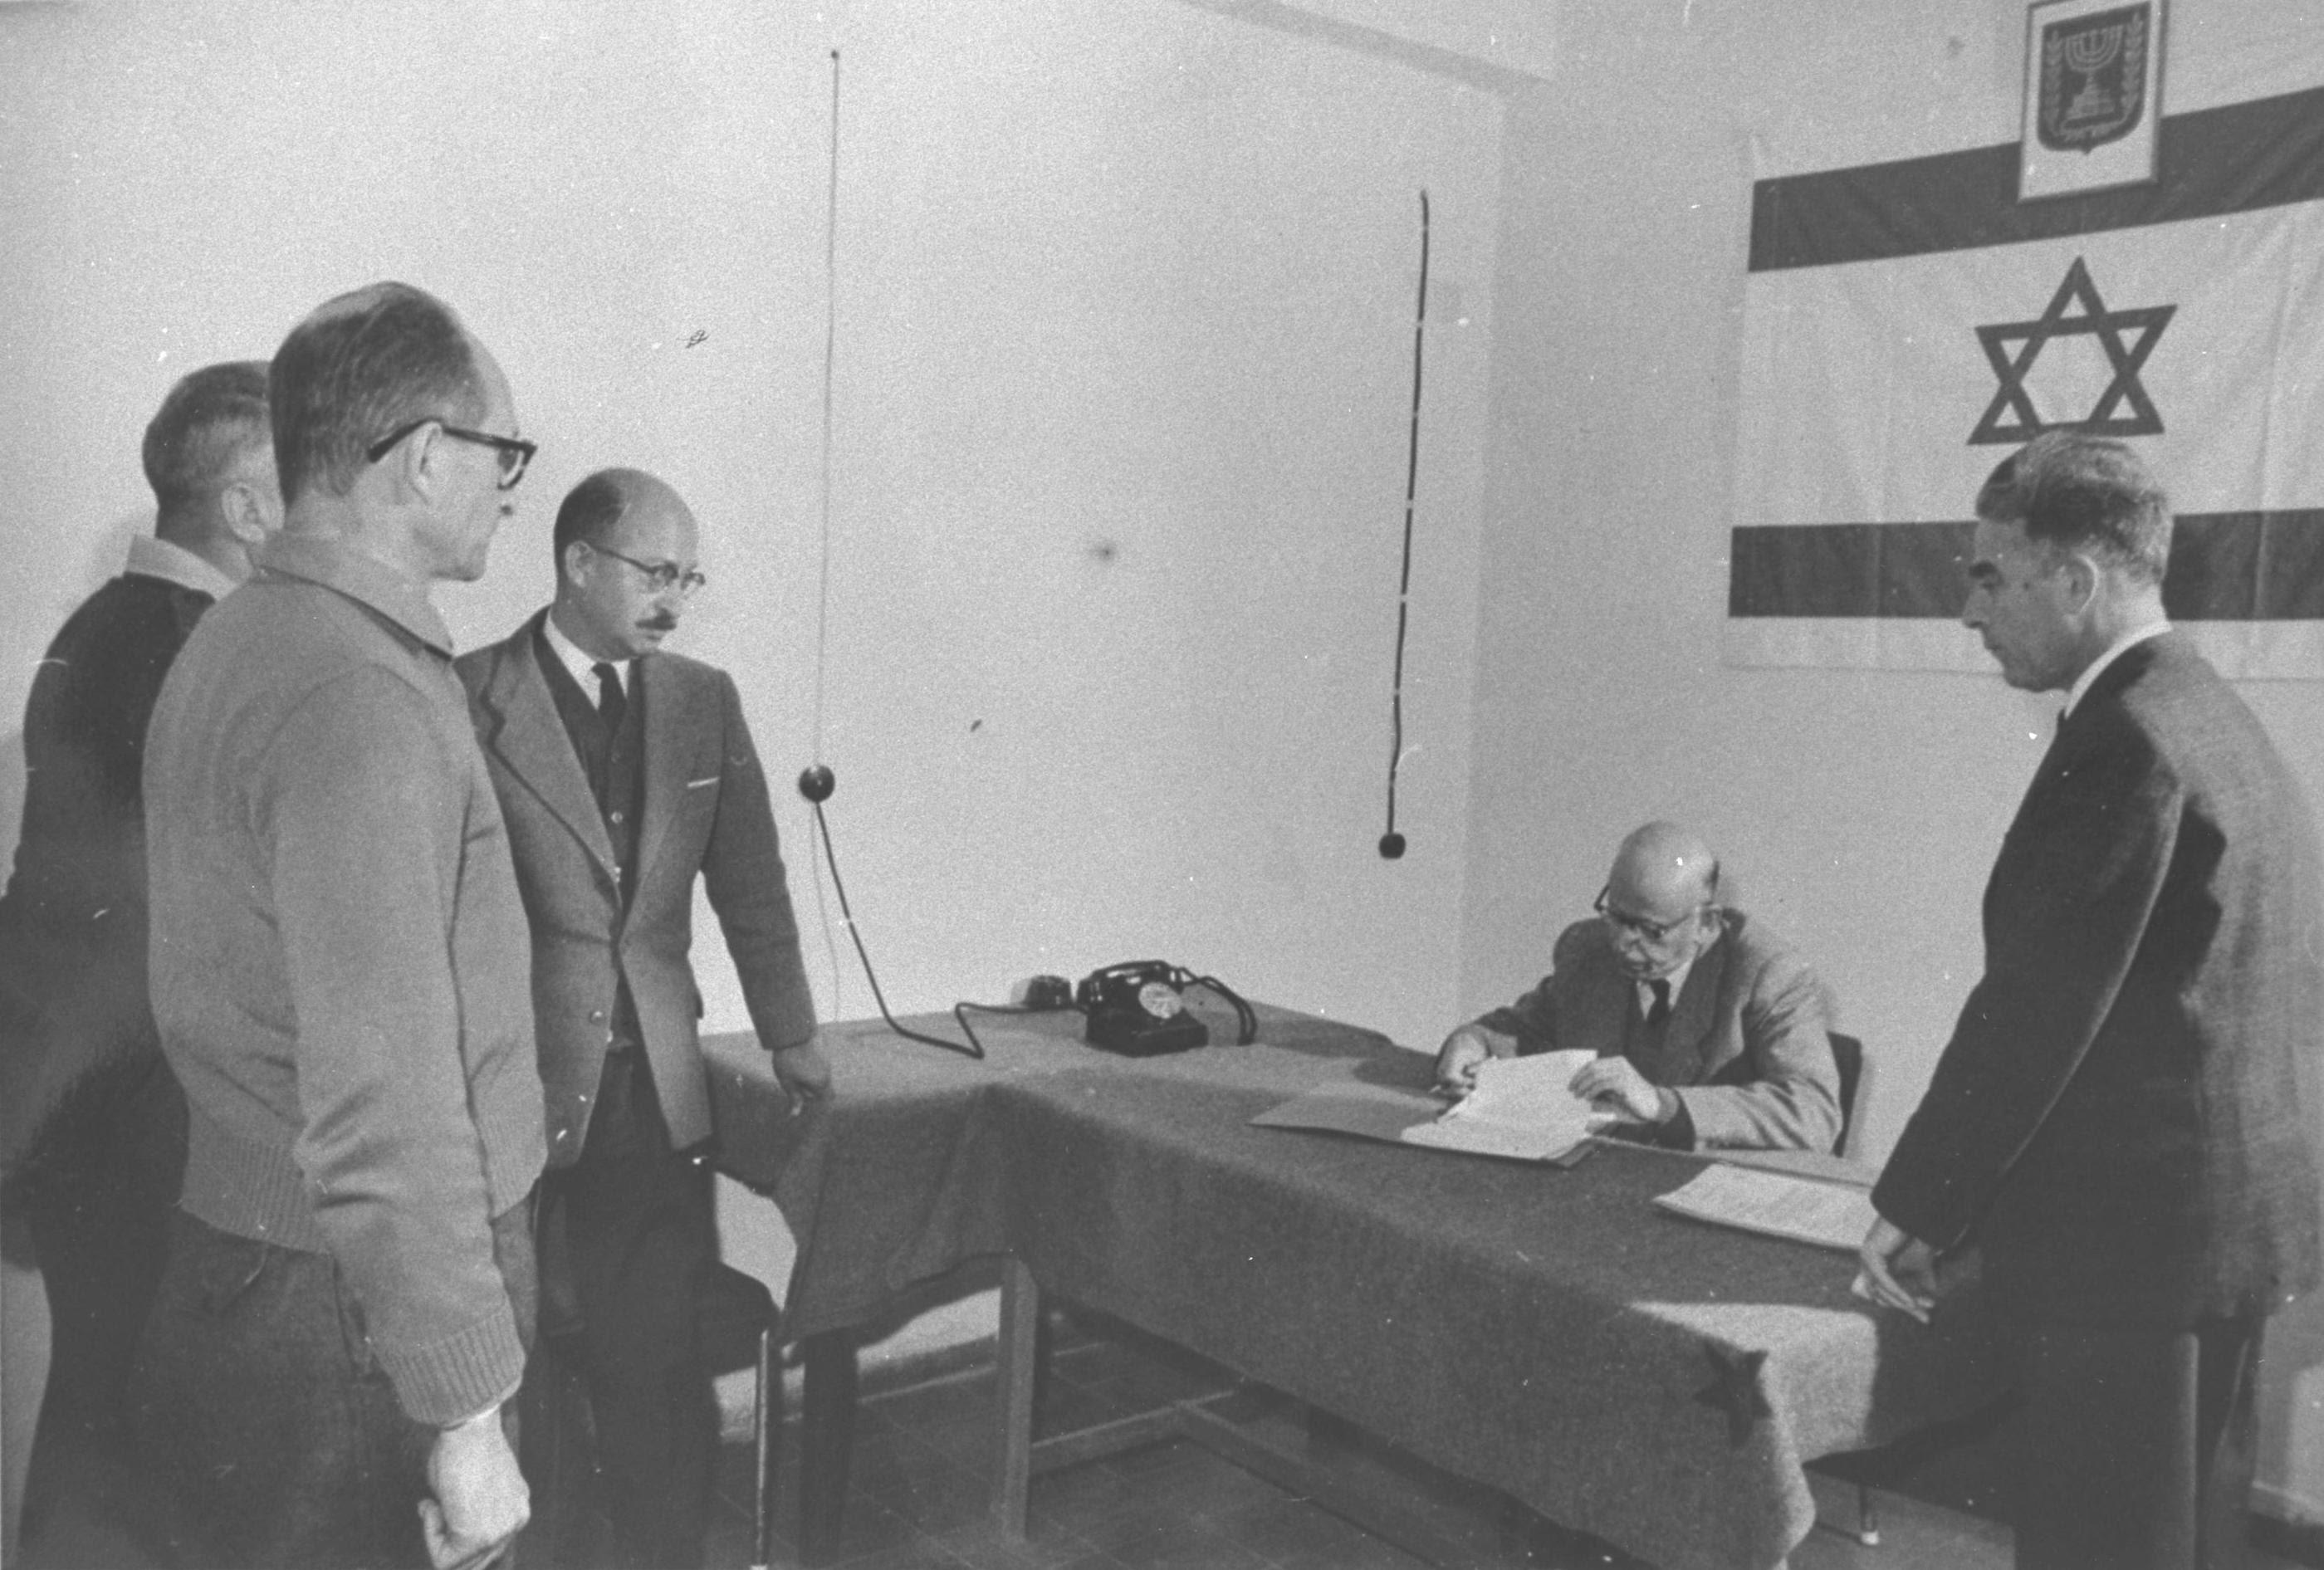 http://upload.wikimedia.org/wikipedia/commons/3/38/Adolf_Eichmann_extension_of_arrest1961.jpg